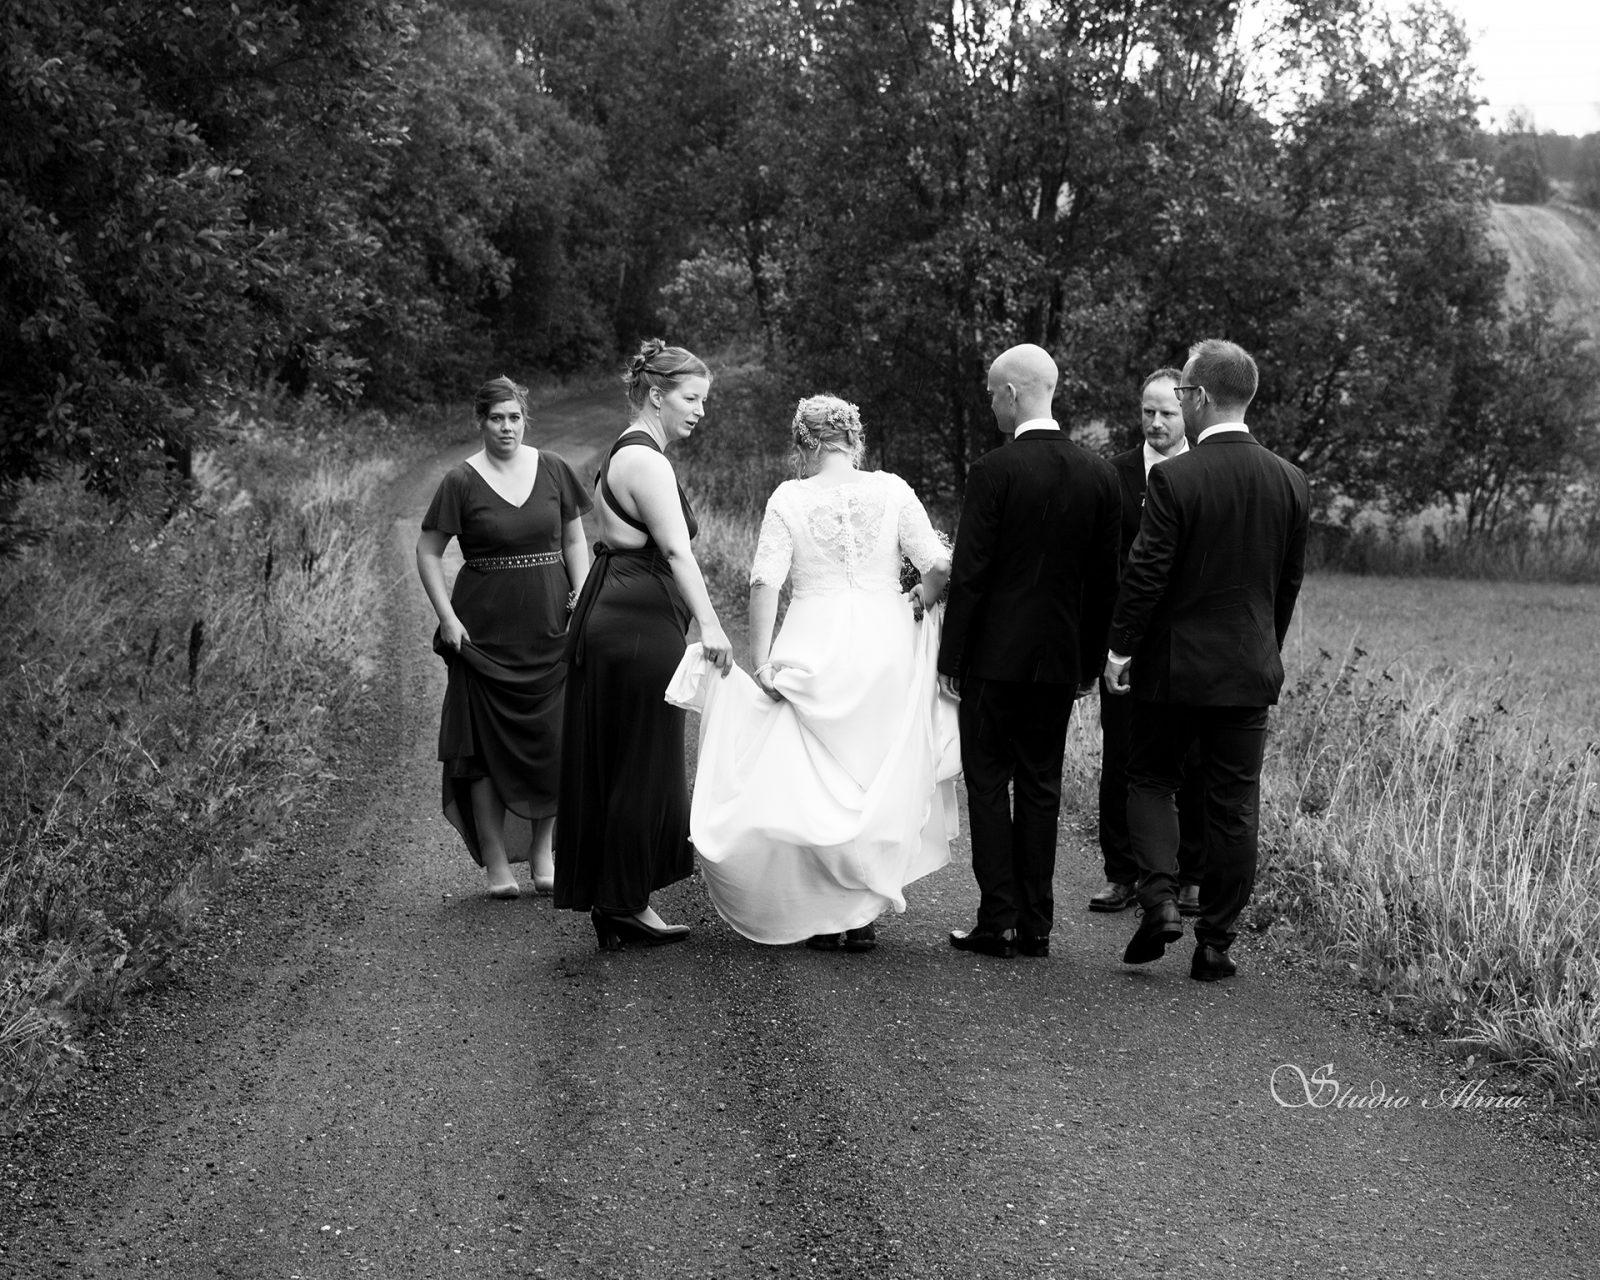 brudepar-forlovere-bilder-fotograf-studioalma